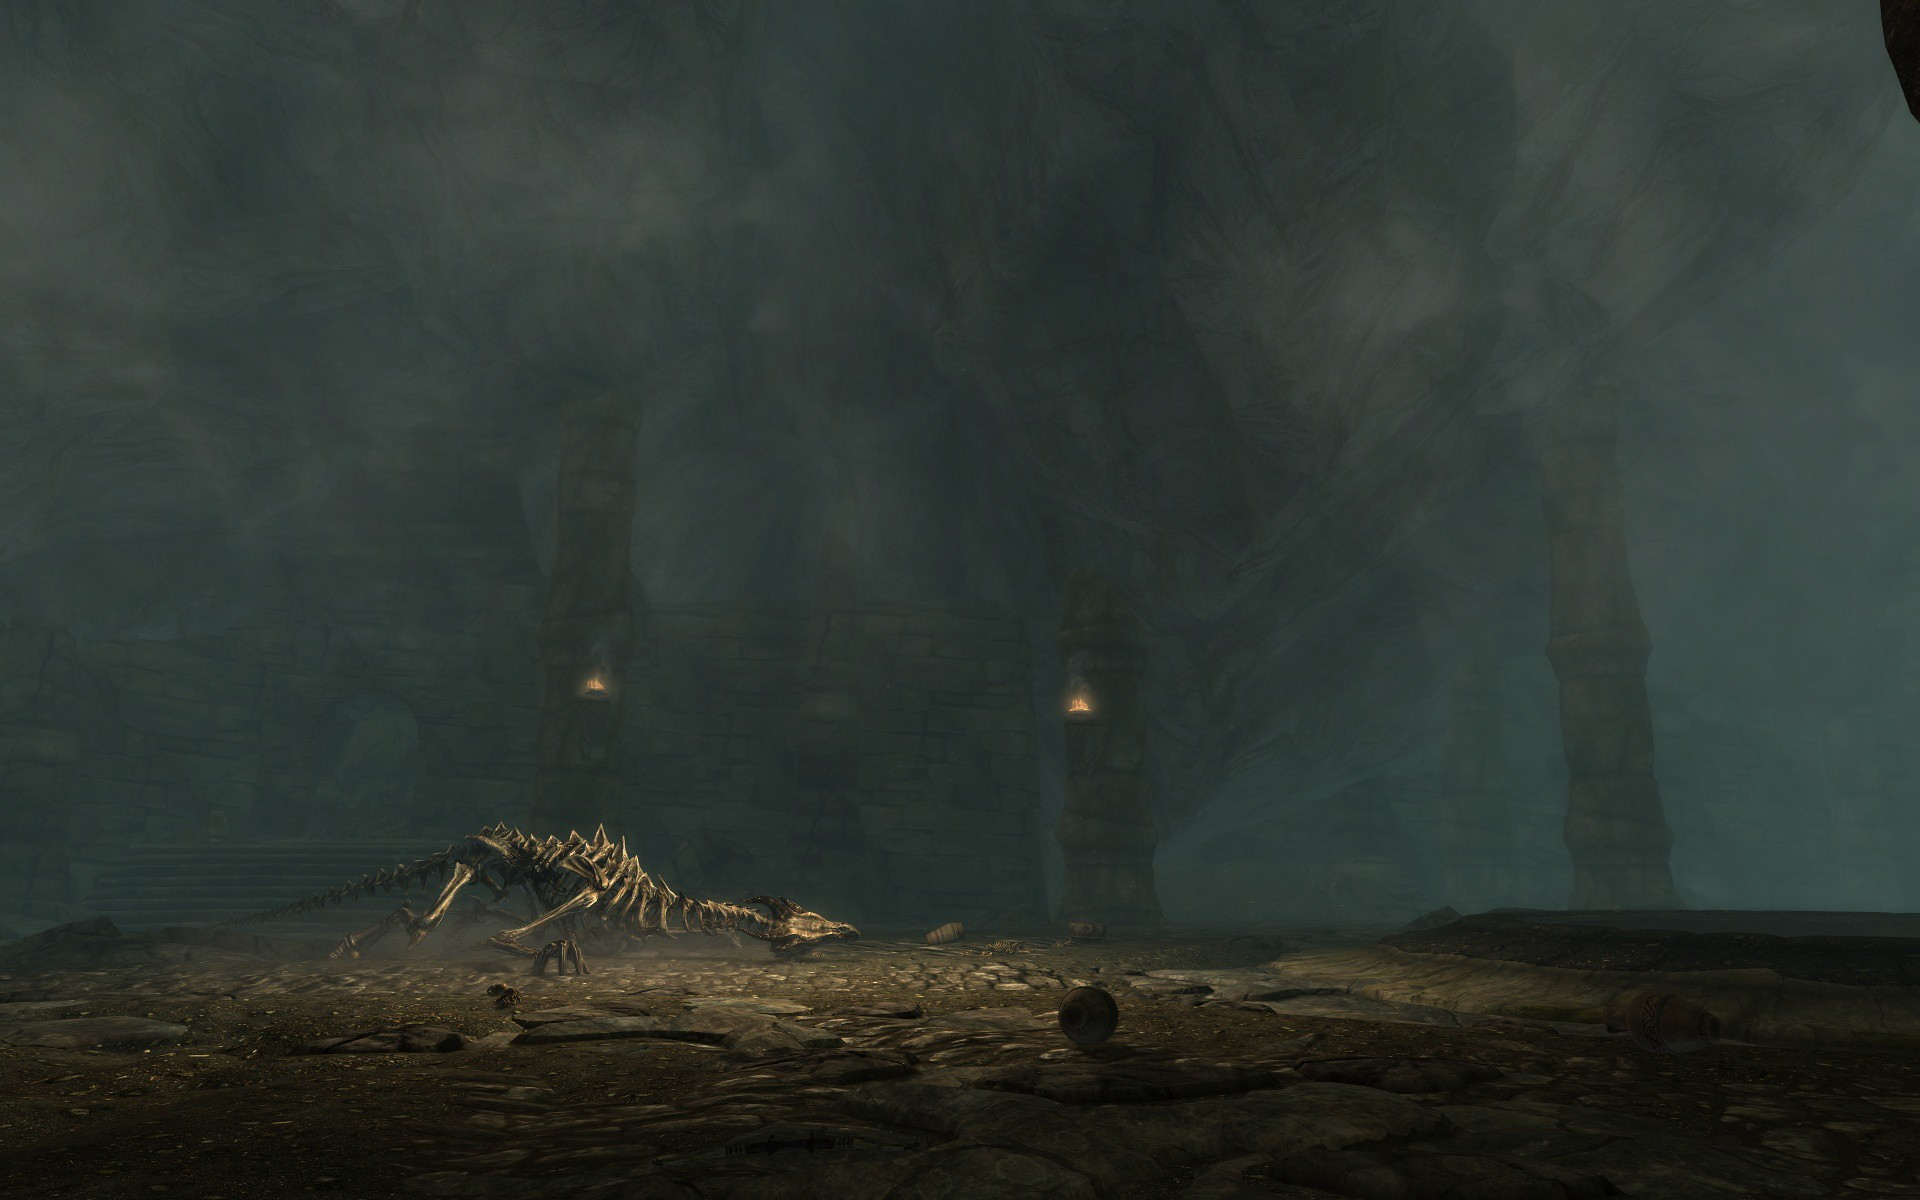 14543683326_315437ab27_k.jpg - The Elder Scrolls 5: Skyrim